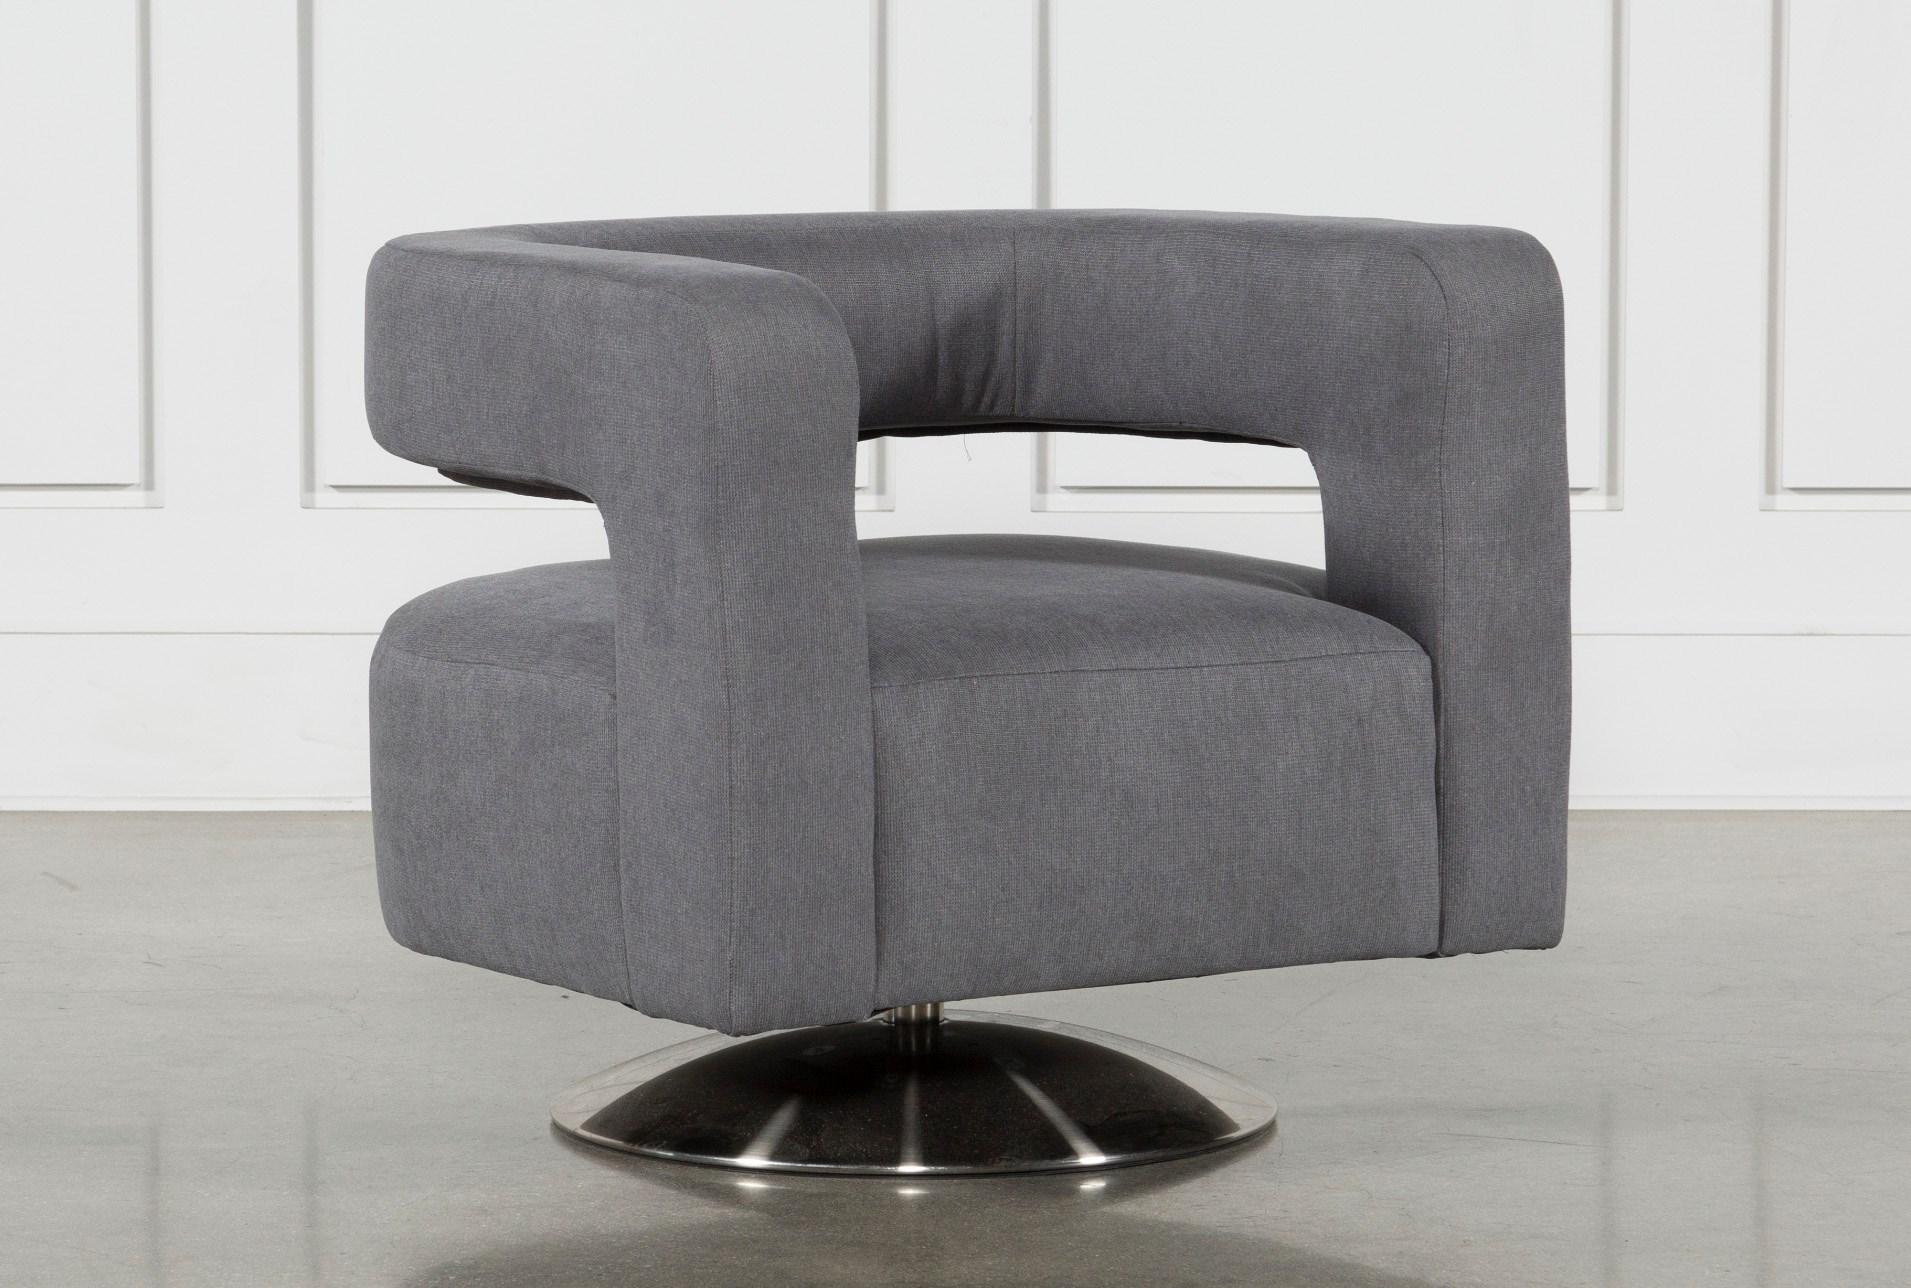 Admirable Chair Swivel Accent Chair Machost Co Dining Chair Design Ideas Machostcouk